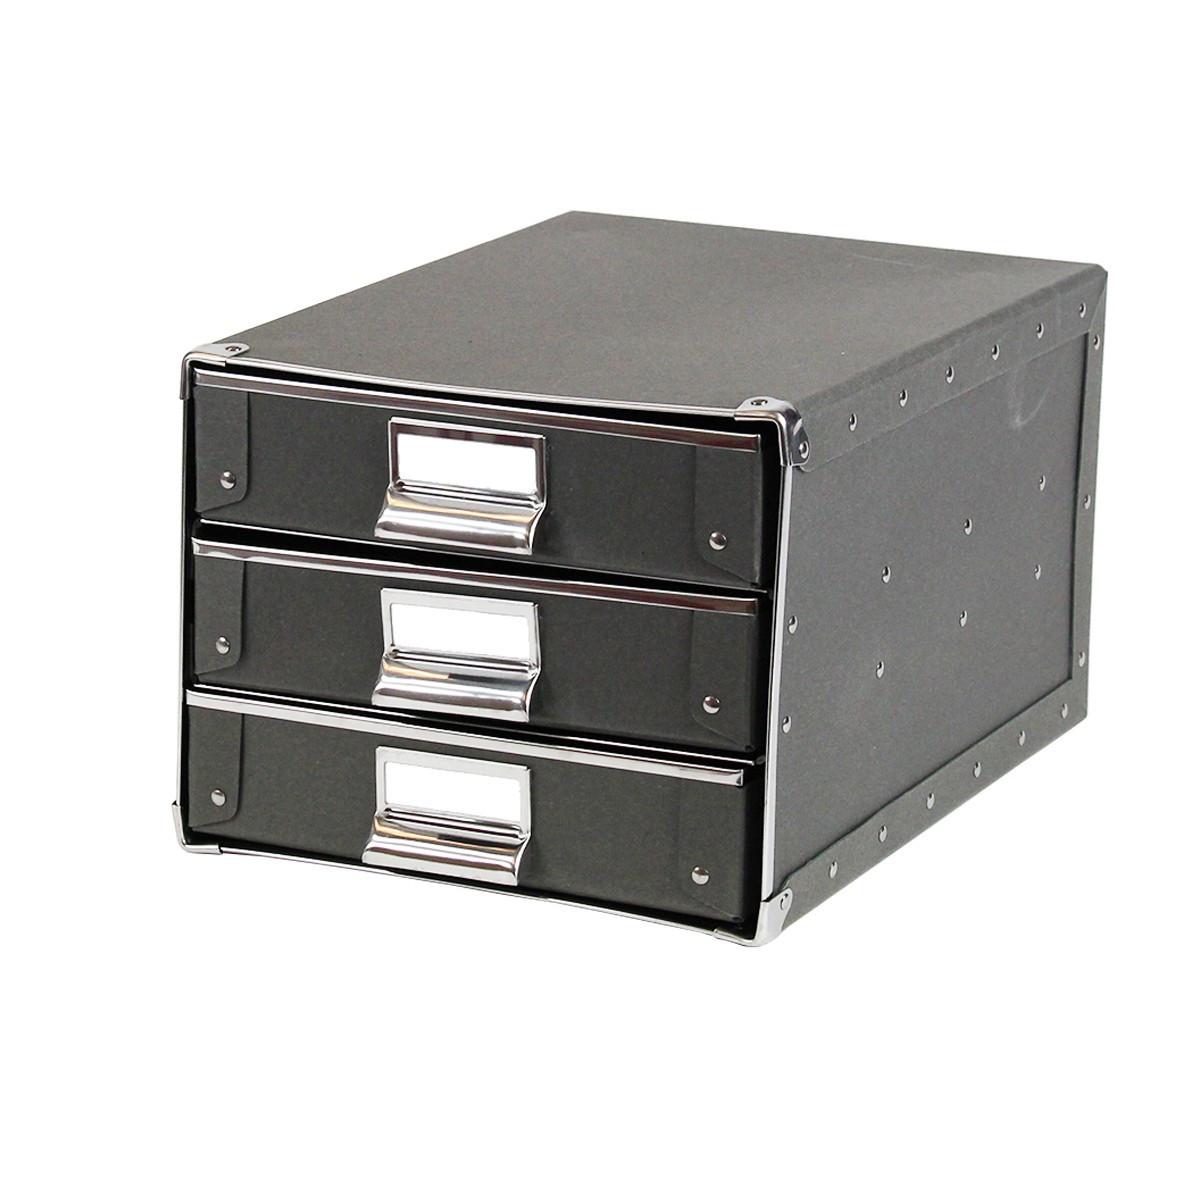 Bo te tiroirs carton gris fonc classement - Boite a outils avec tiroirs ...